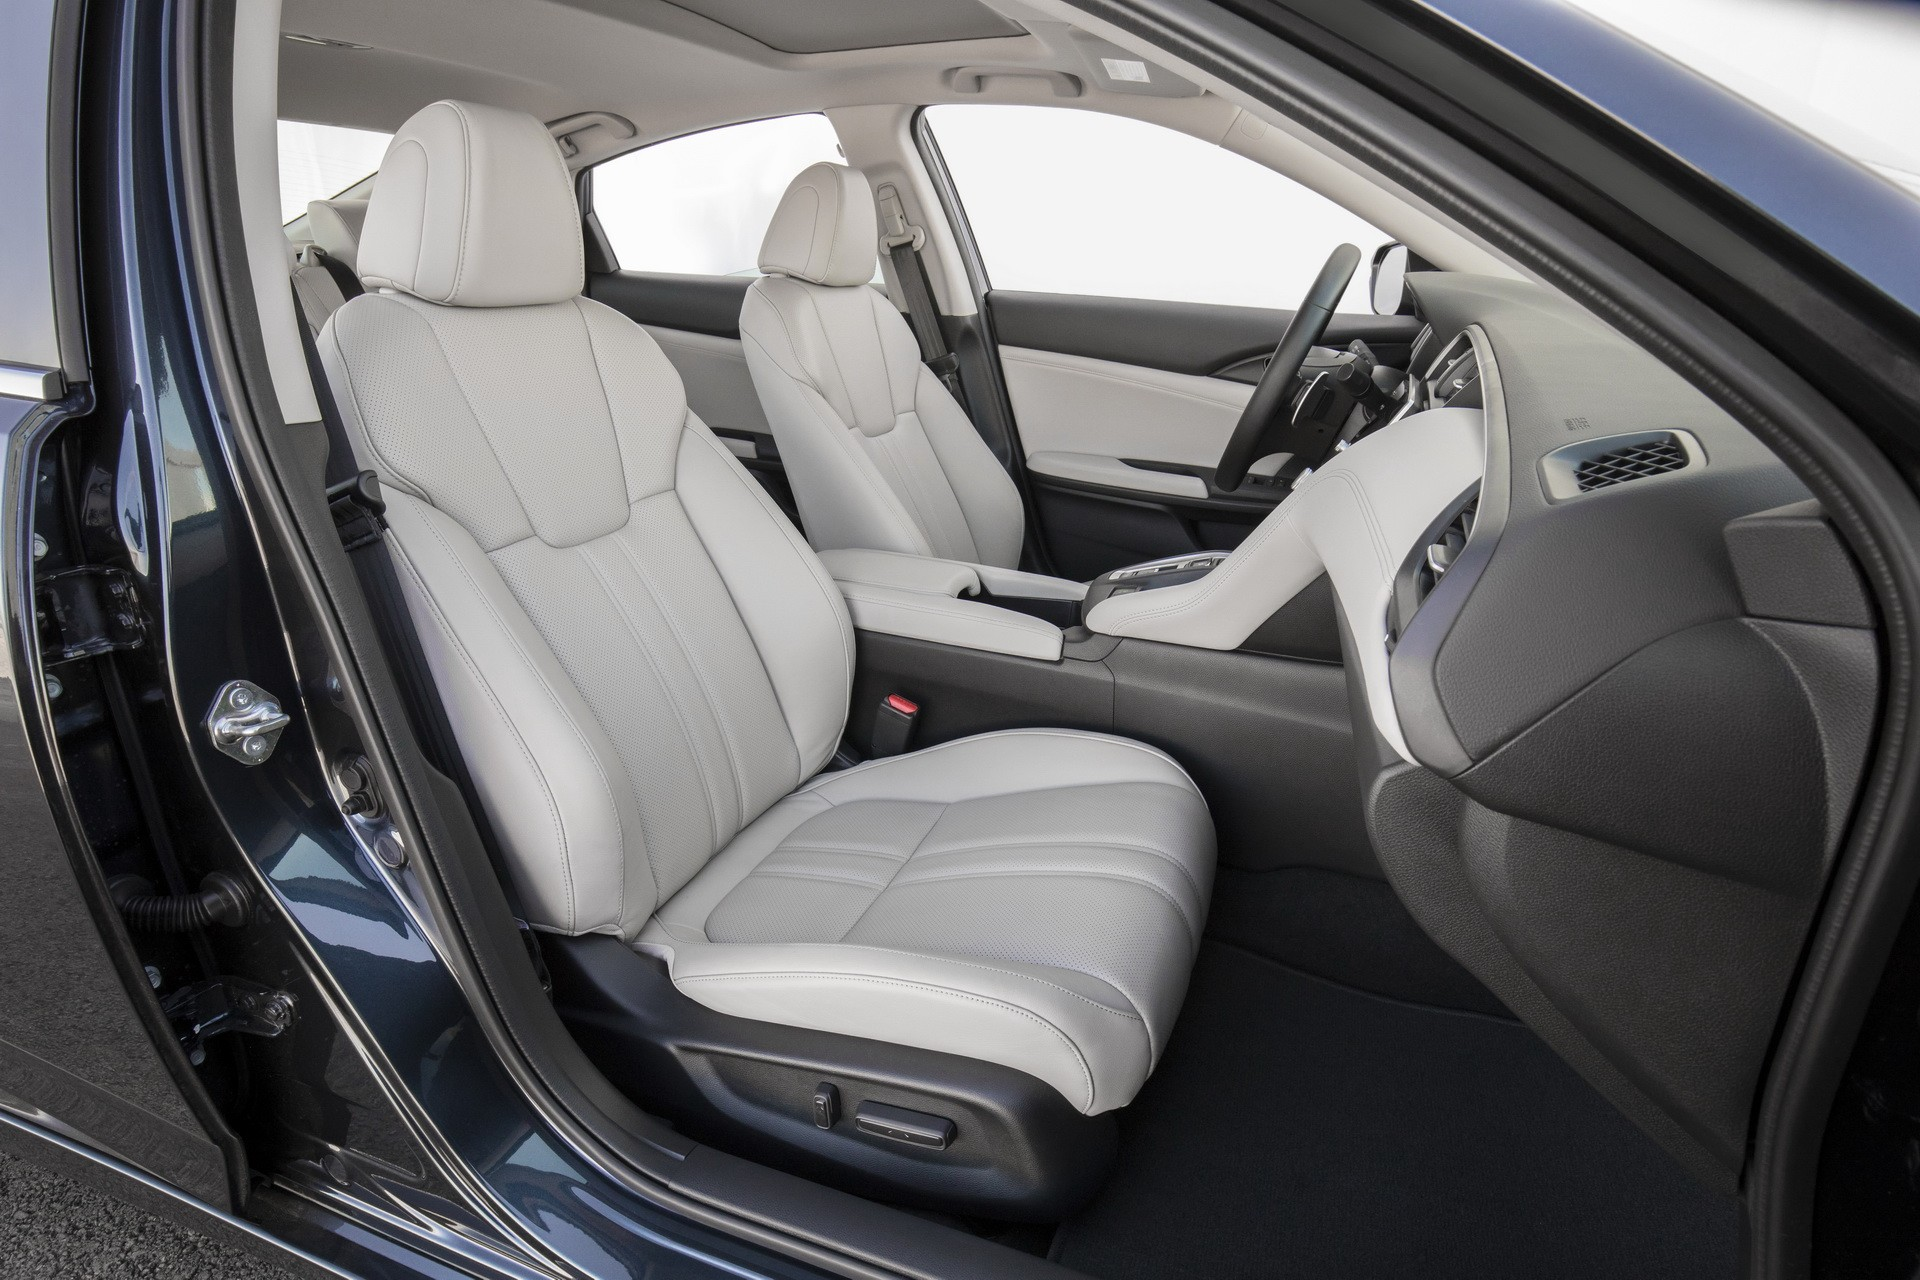 2019 Honda Insight Launched Into Production at Greensburg ...